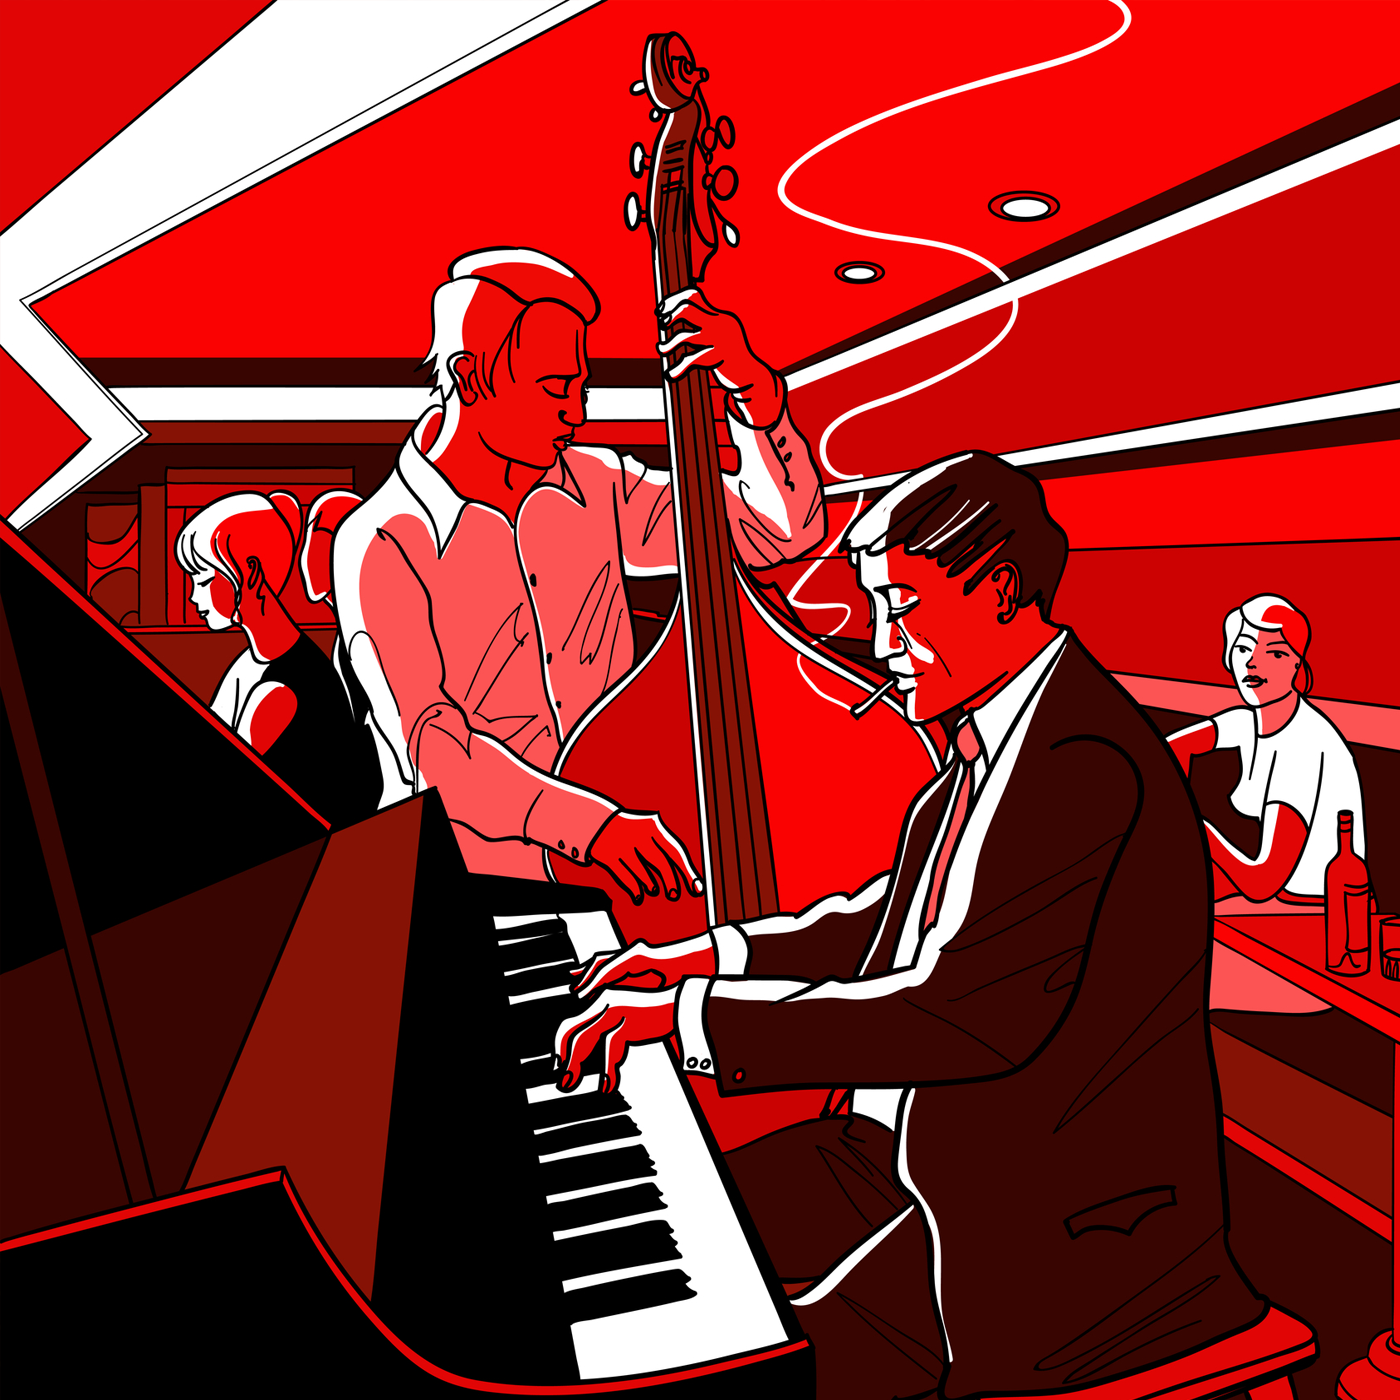 piano trios on jazzradio com jazzradio com enjoy great jazz music